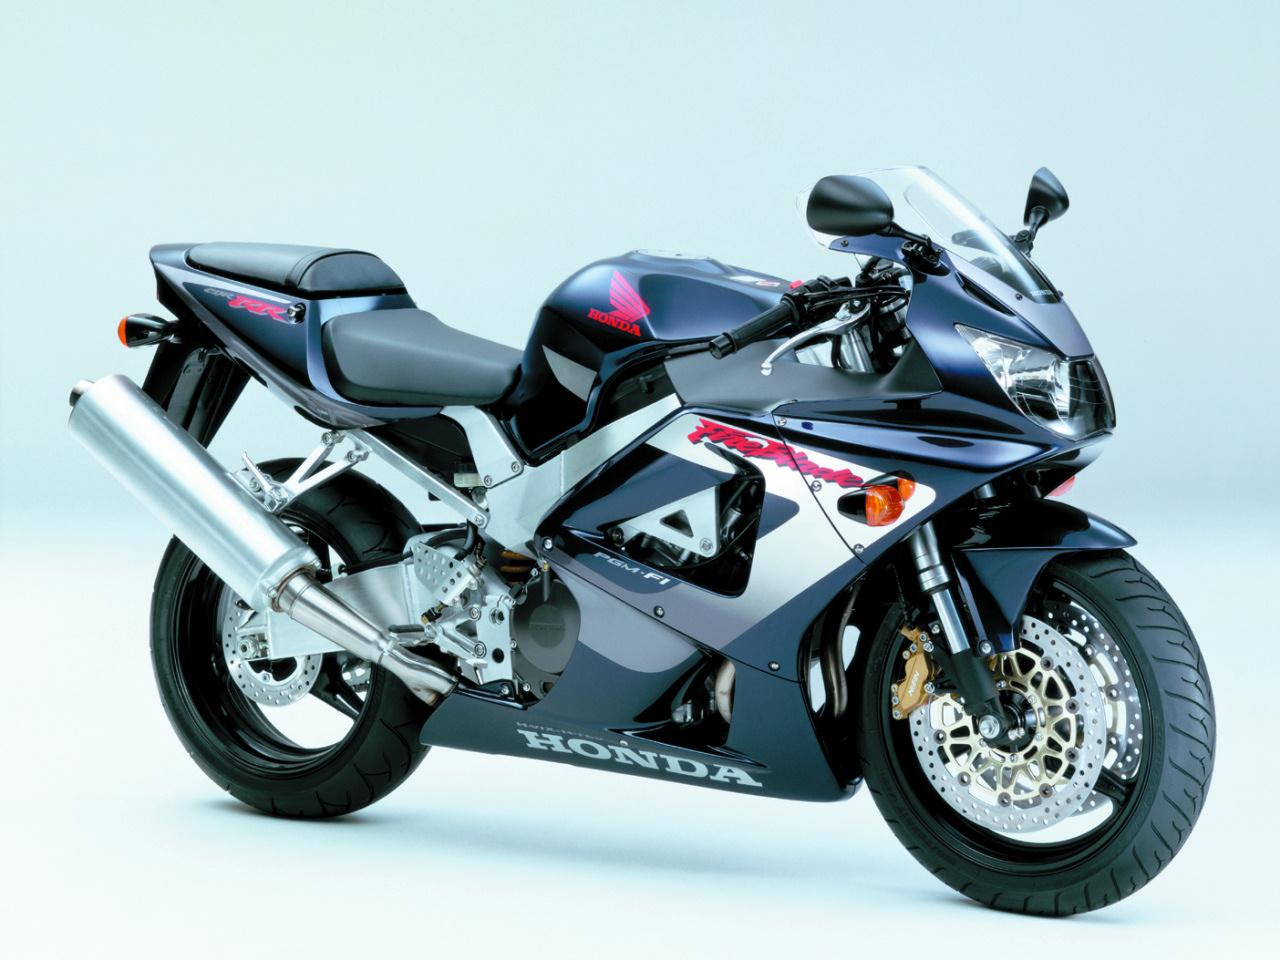 Cbr 929 Rr 2000-2001 - Sportives